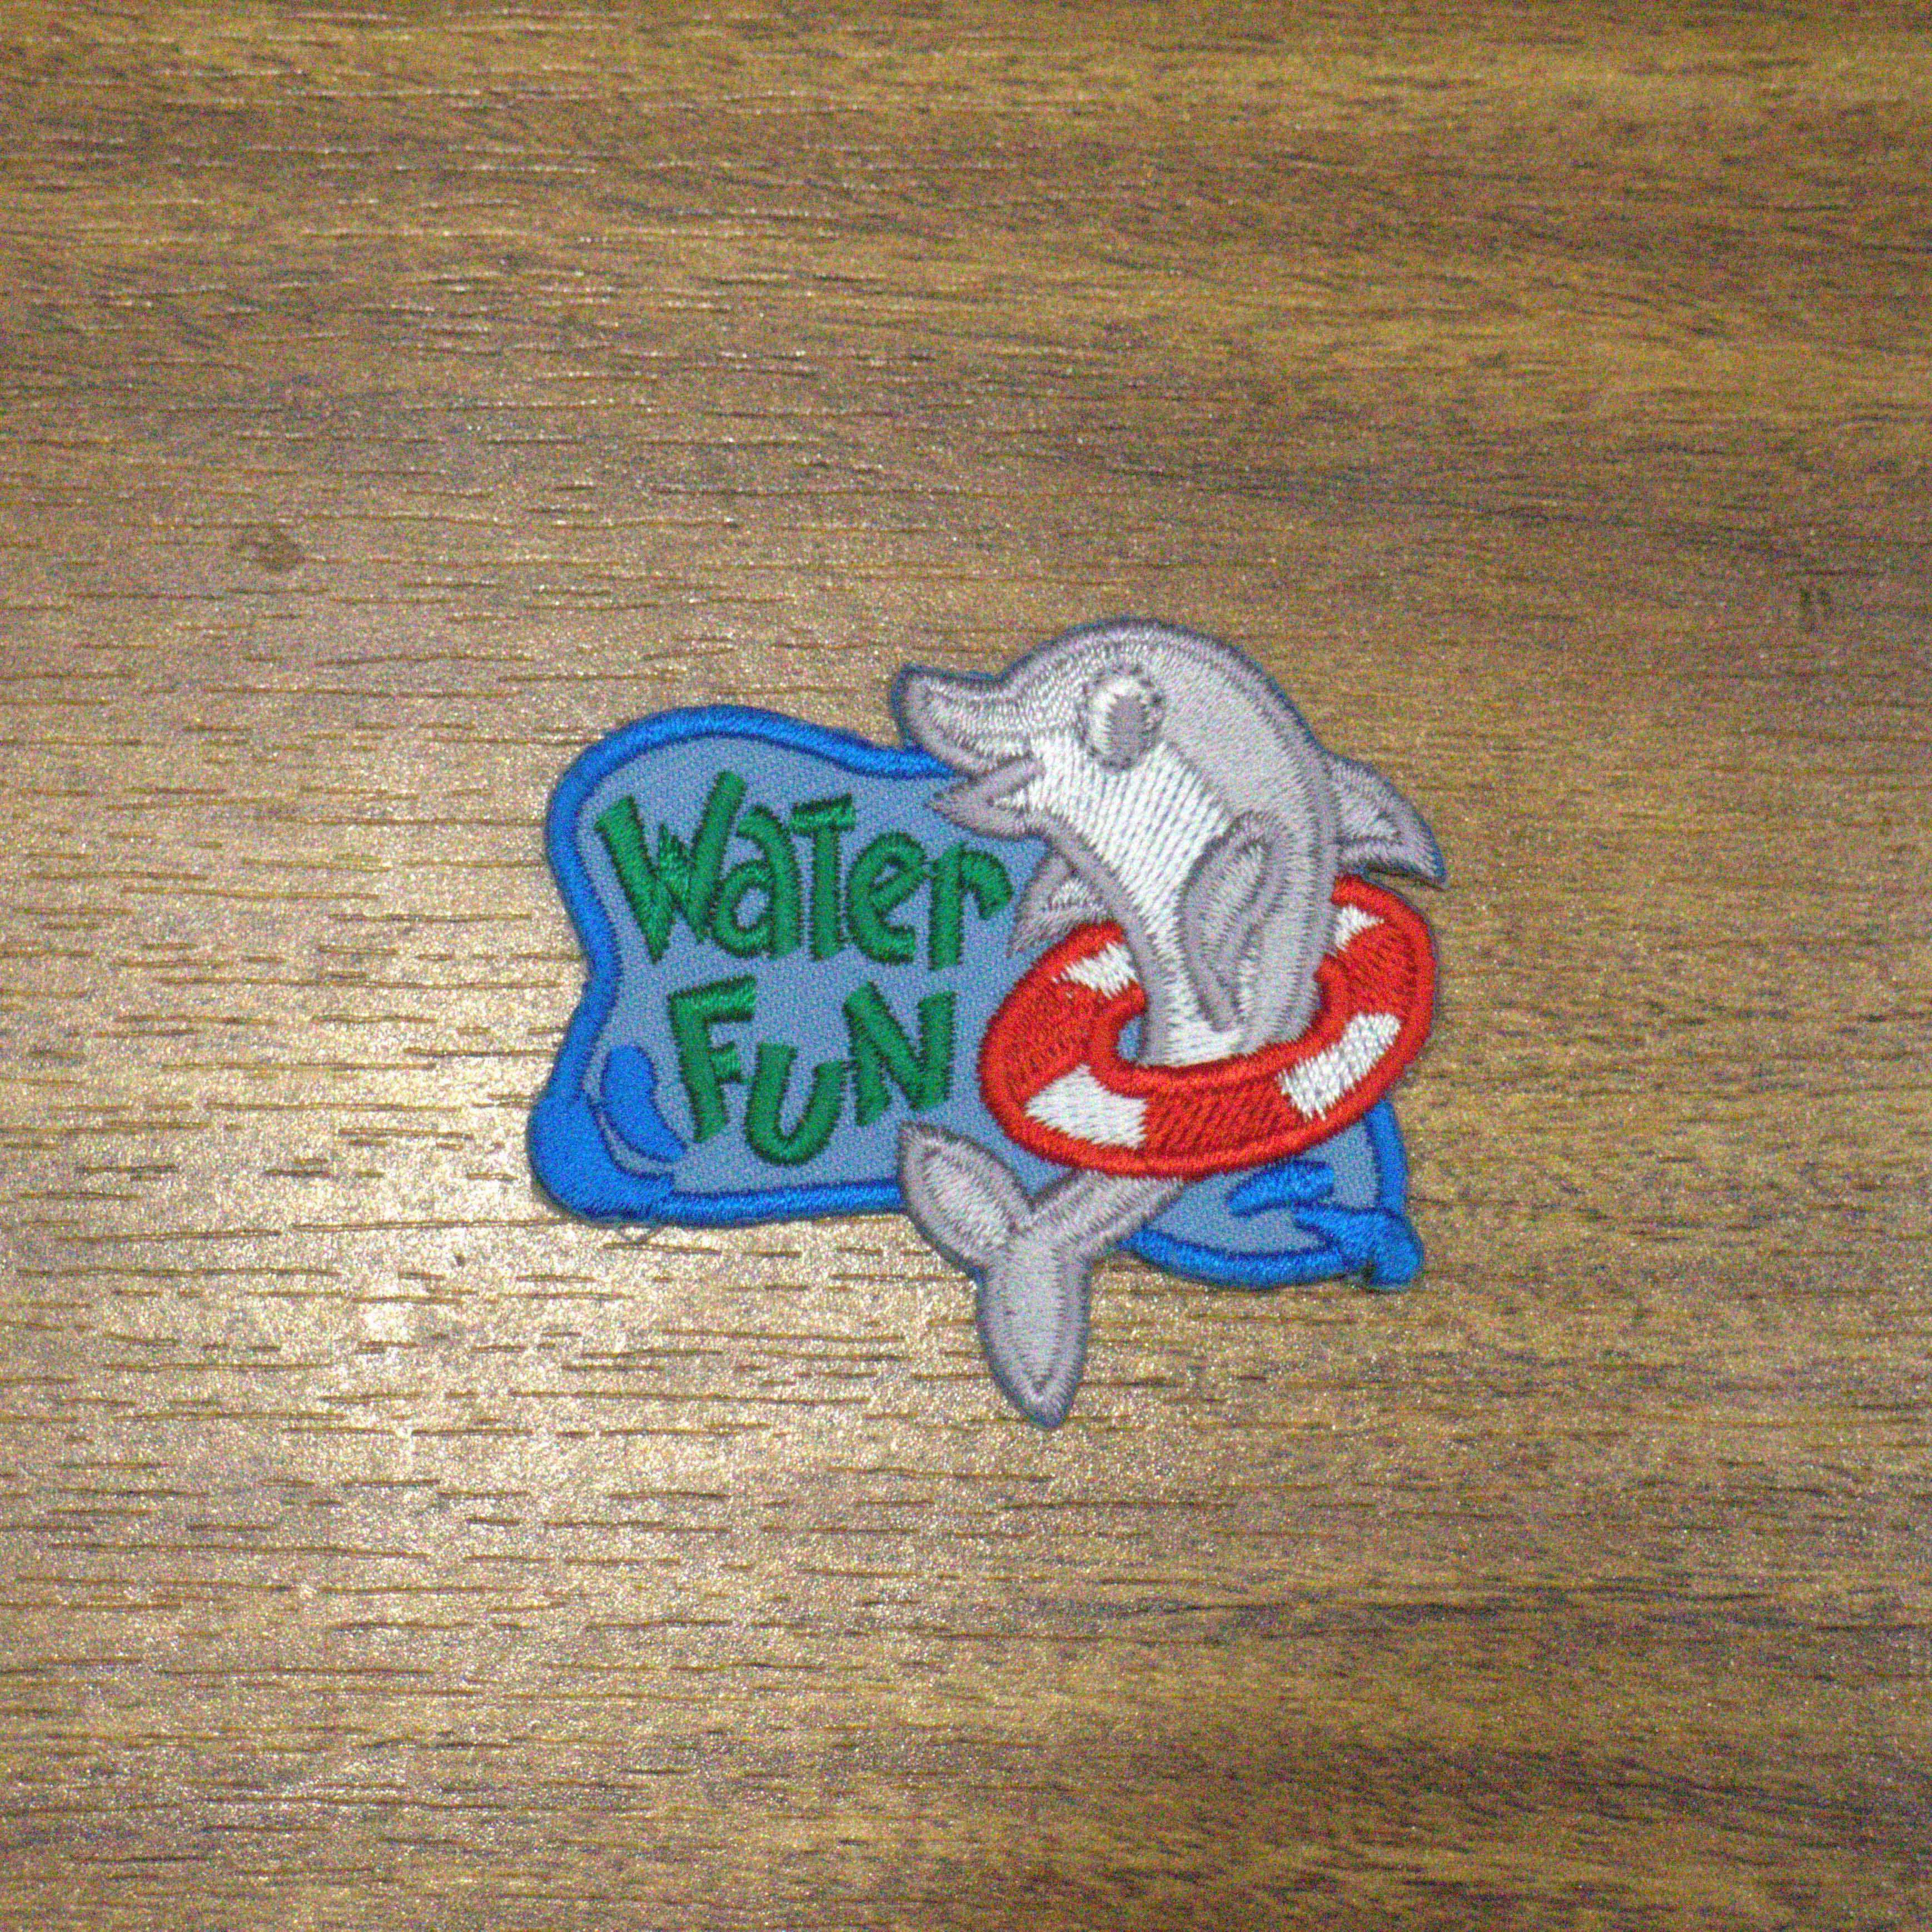 Ukuran Kecil Kain Patch Anak Denim Pakaian Bordir Dekoratif Patch Stiker MINI Stiker Lencana Jahit Tangan Menjahit Pada Patch